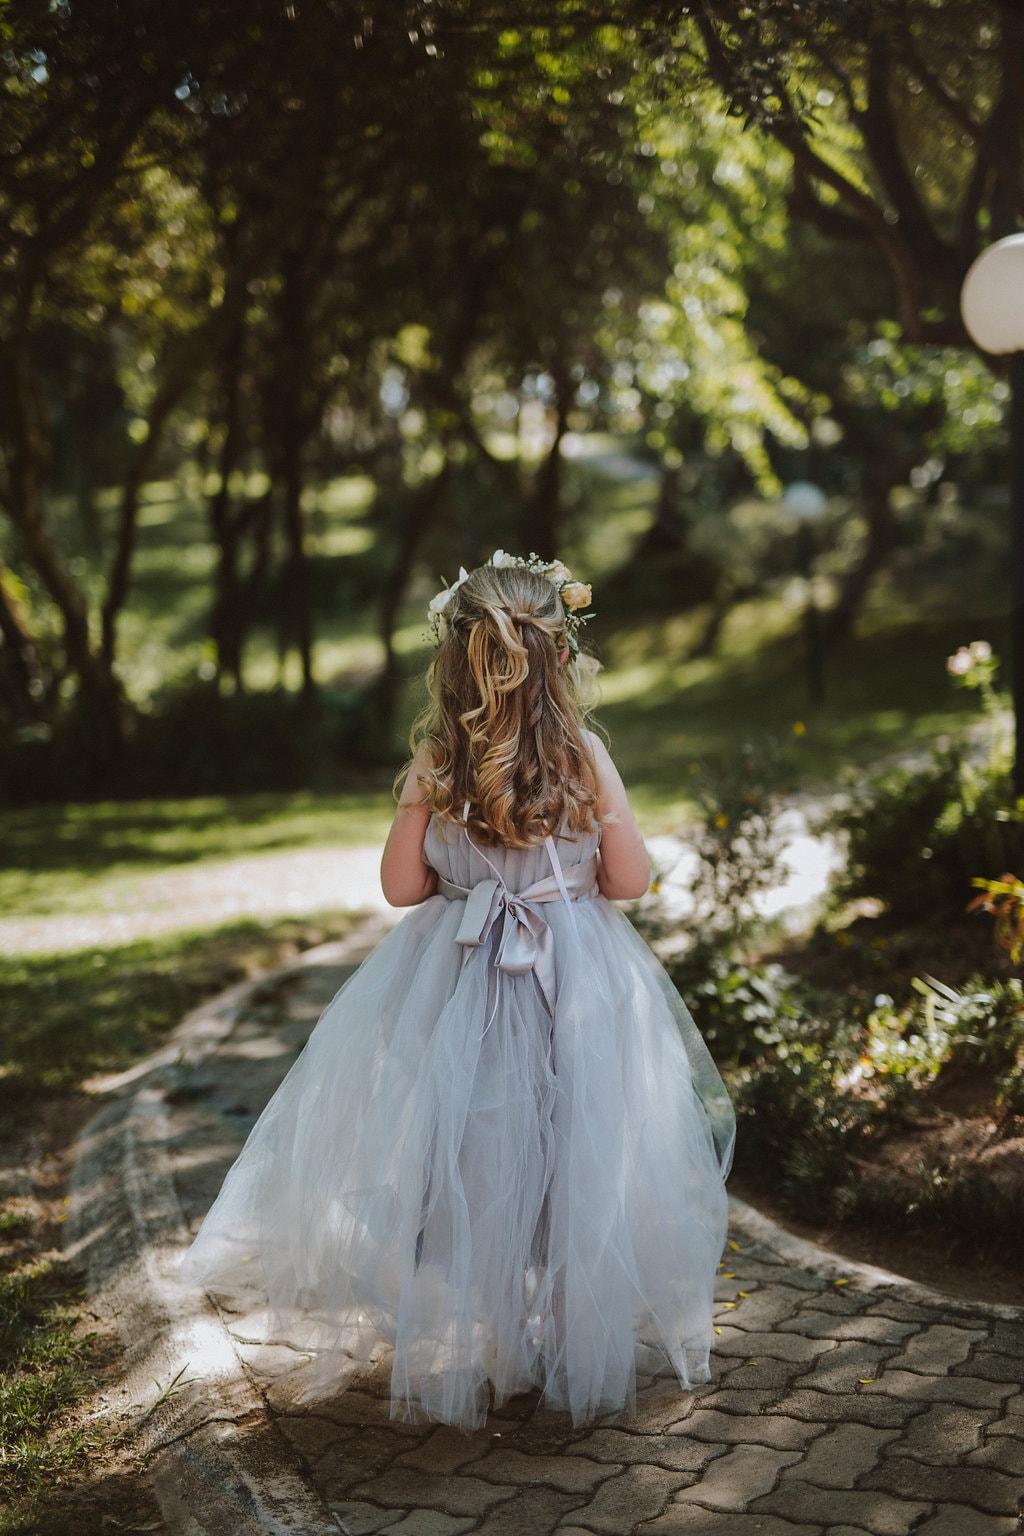 Cute Grey Flower Girl Dress | Image: Jessica J Photography